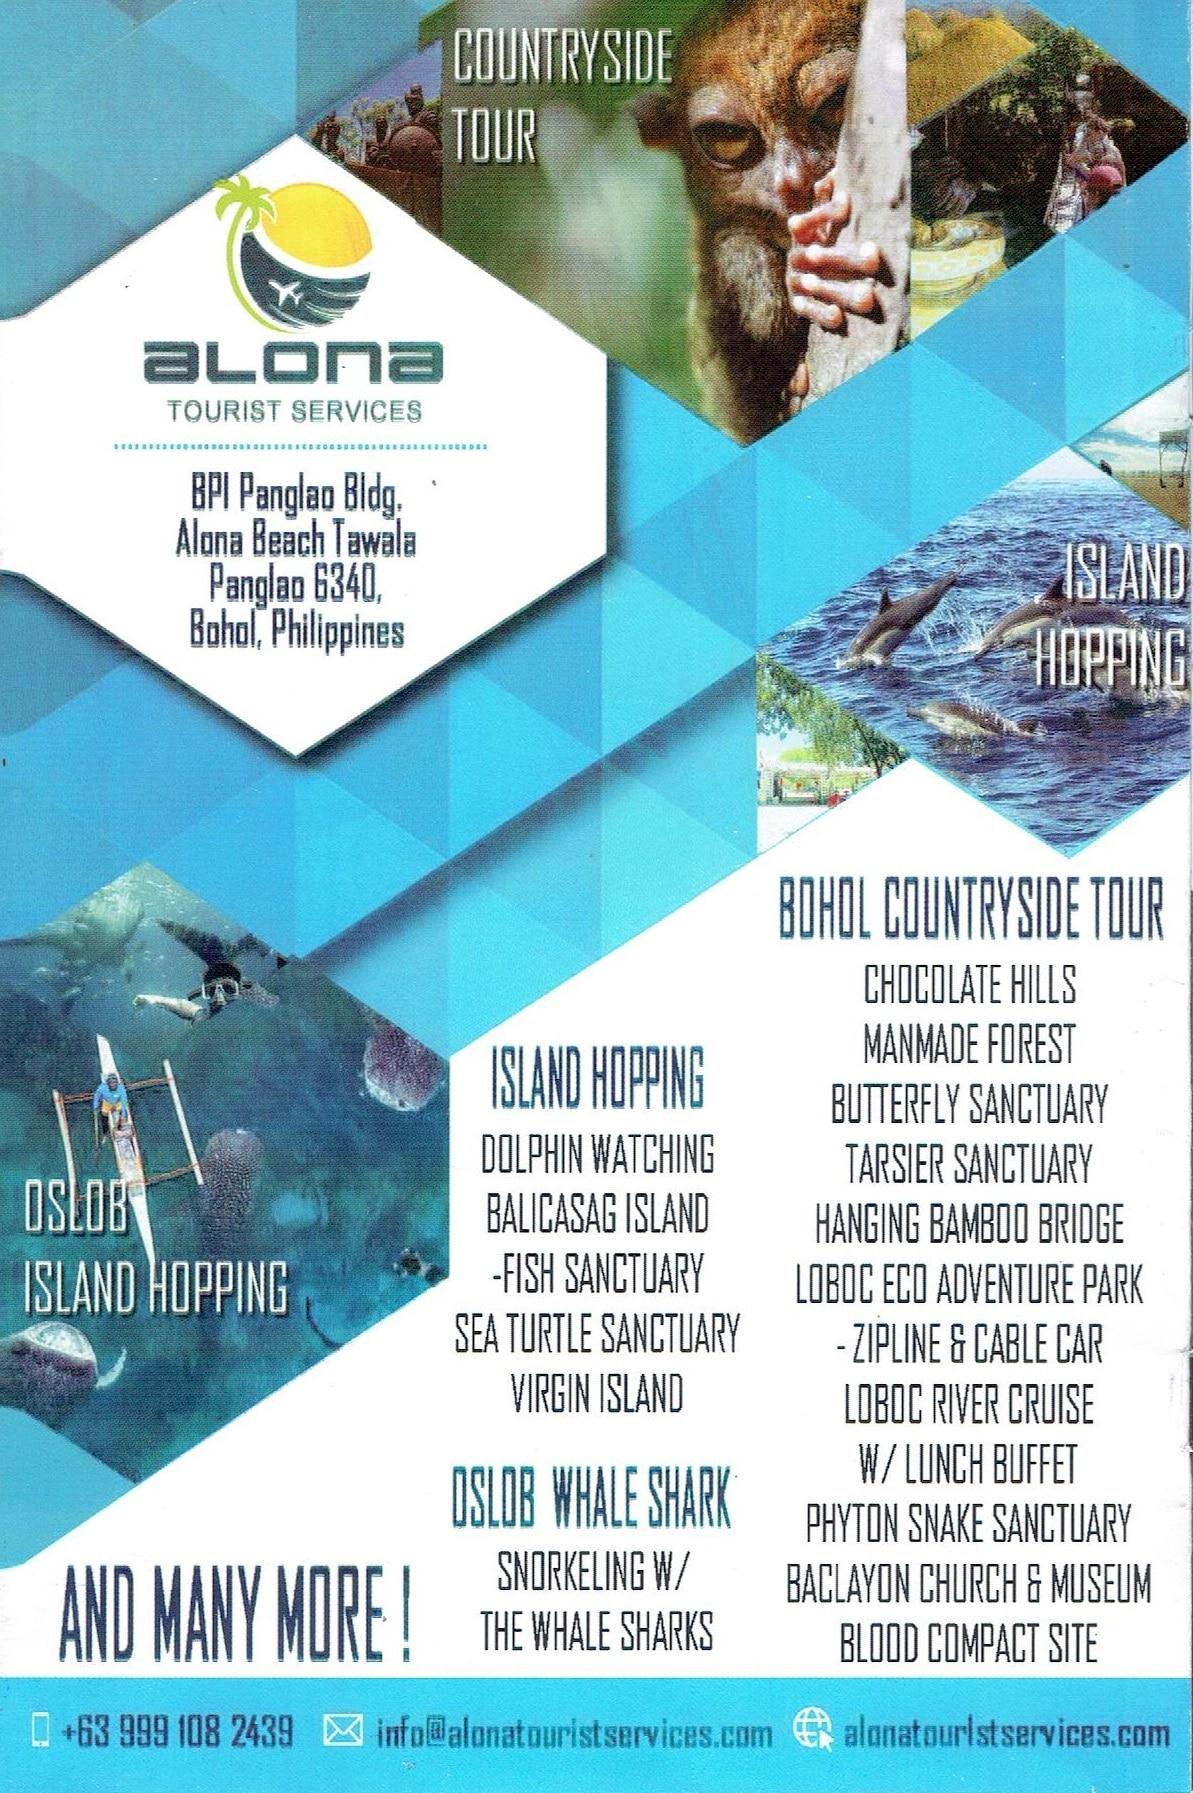 Alona Tourist Services